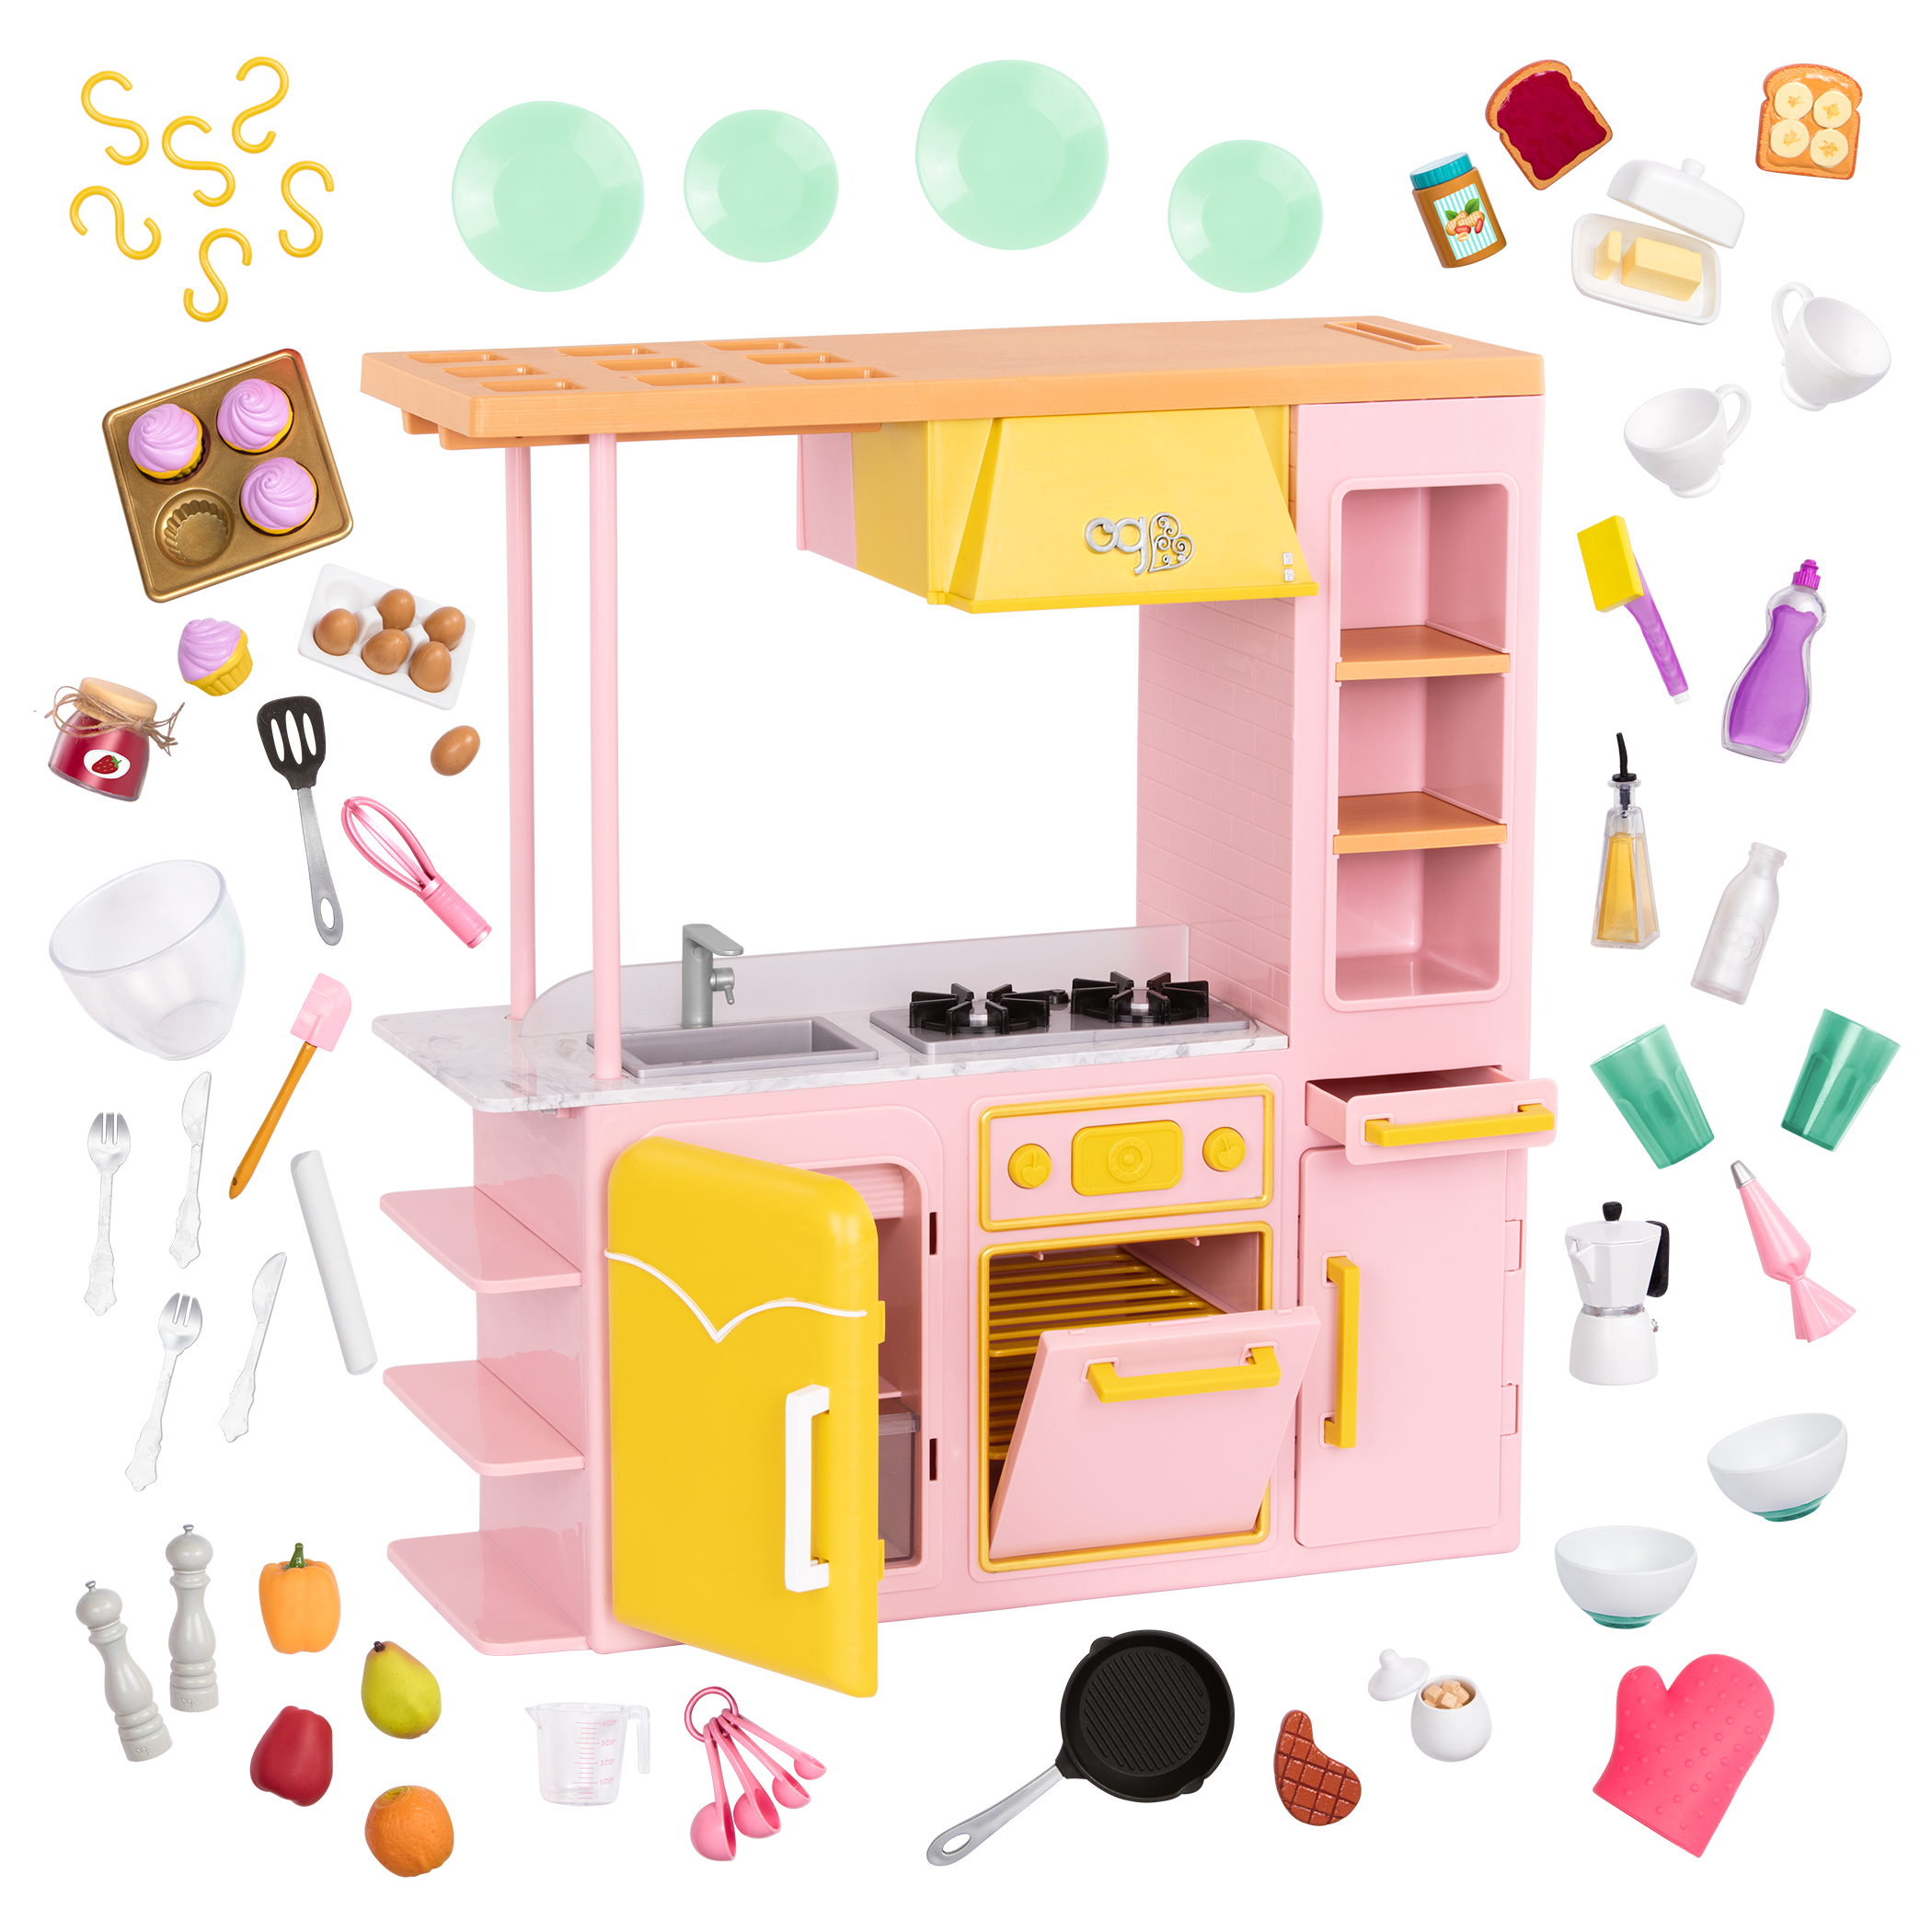 Sweet Kitchen Set for 18-inch Dolls